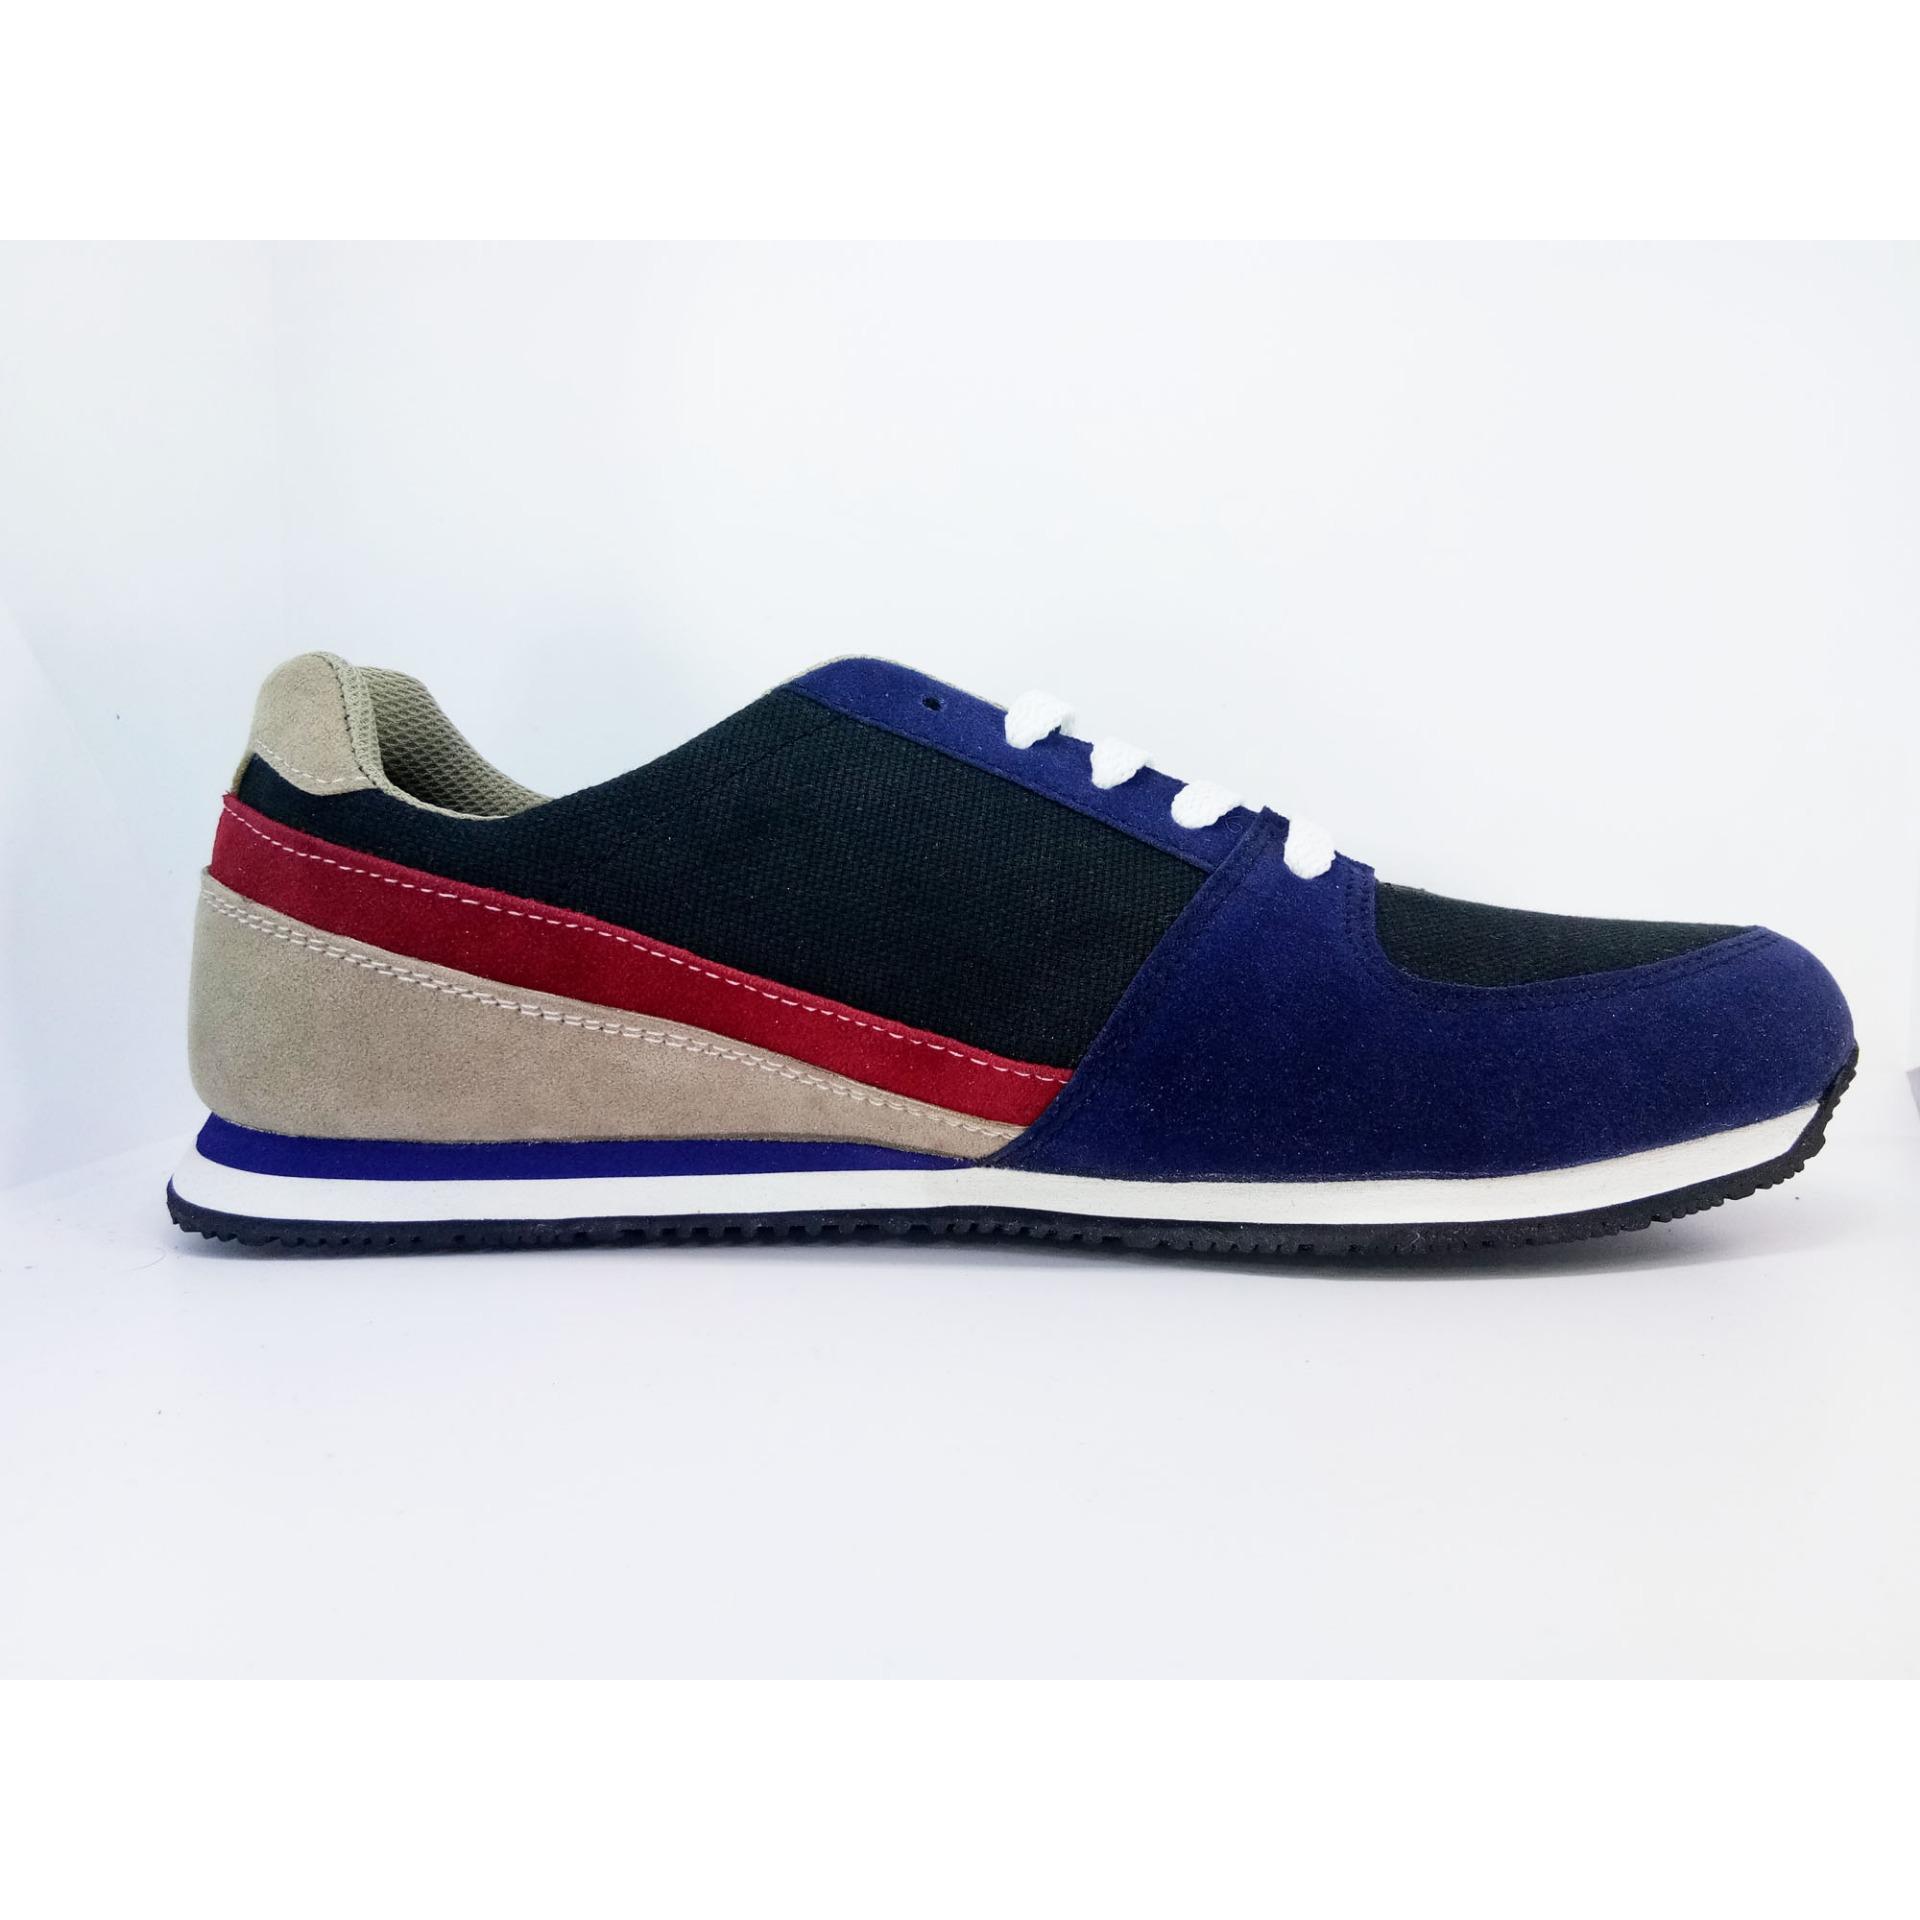 Dimana Beli Gshop Sny 6076 Sepatu Sneaker Pria Suede Eva Bagus Navy Kom Gshop